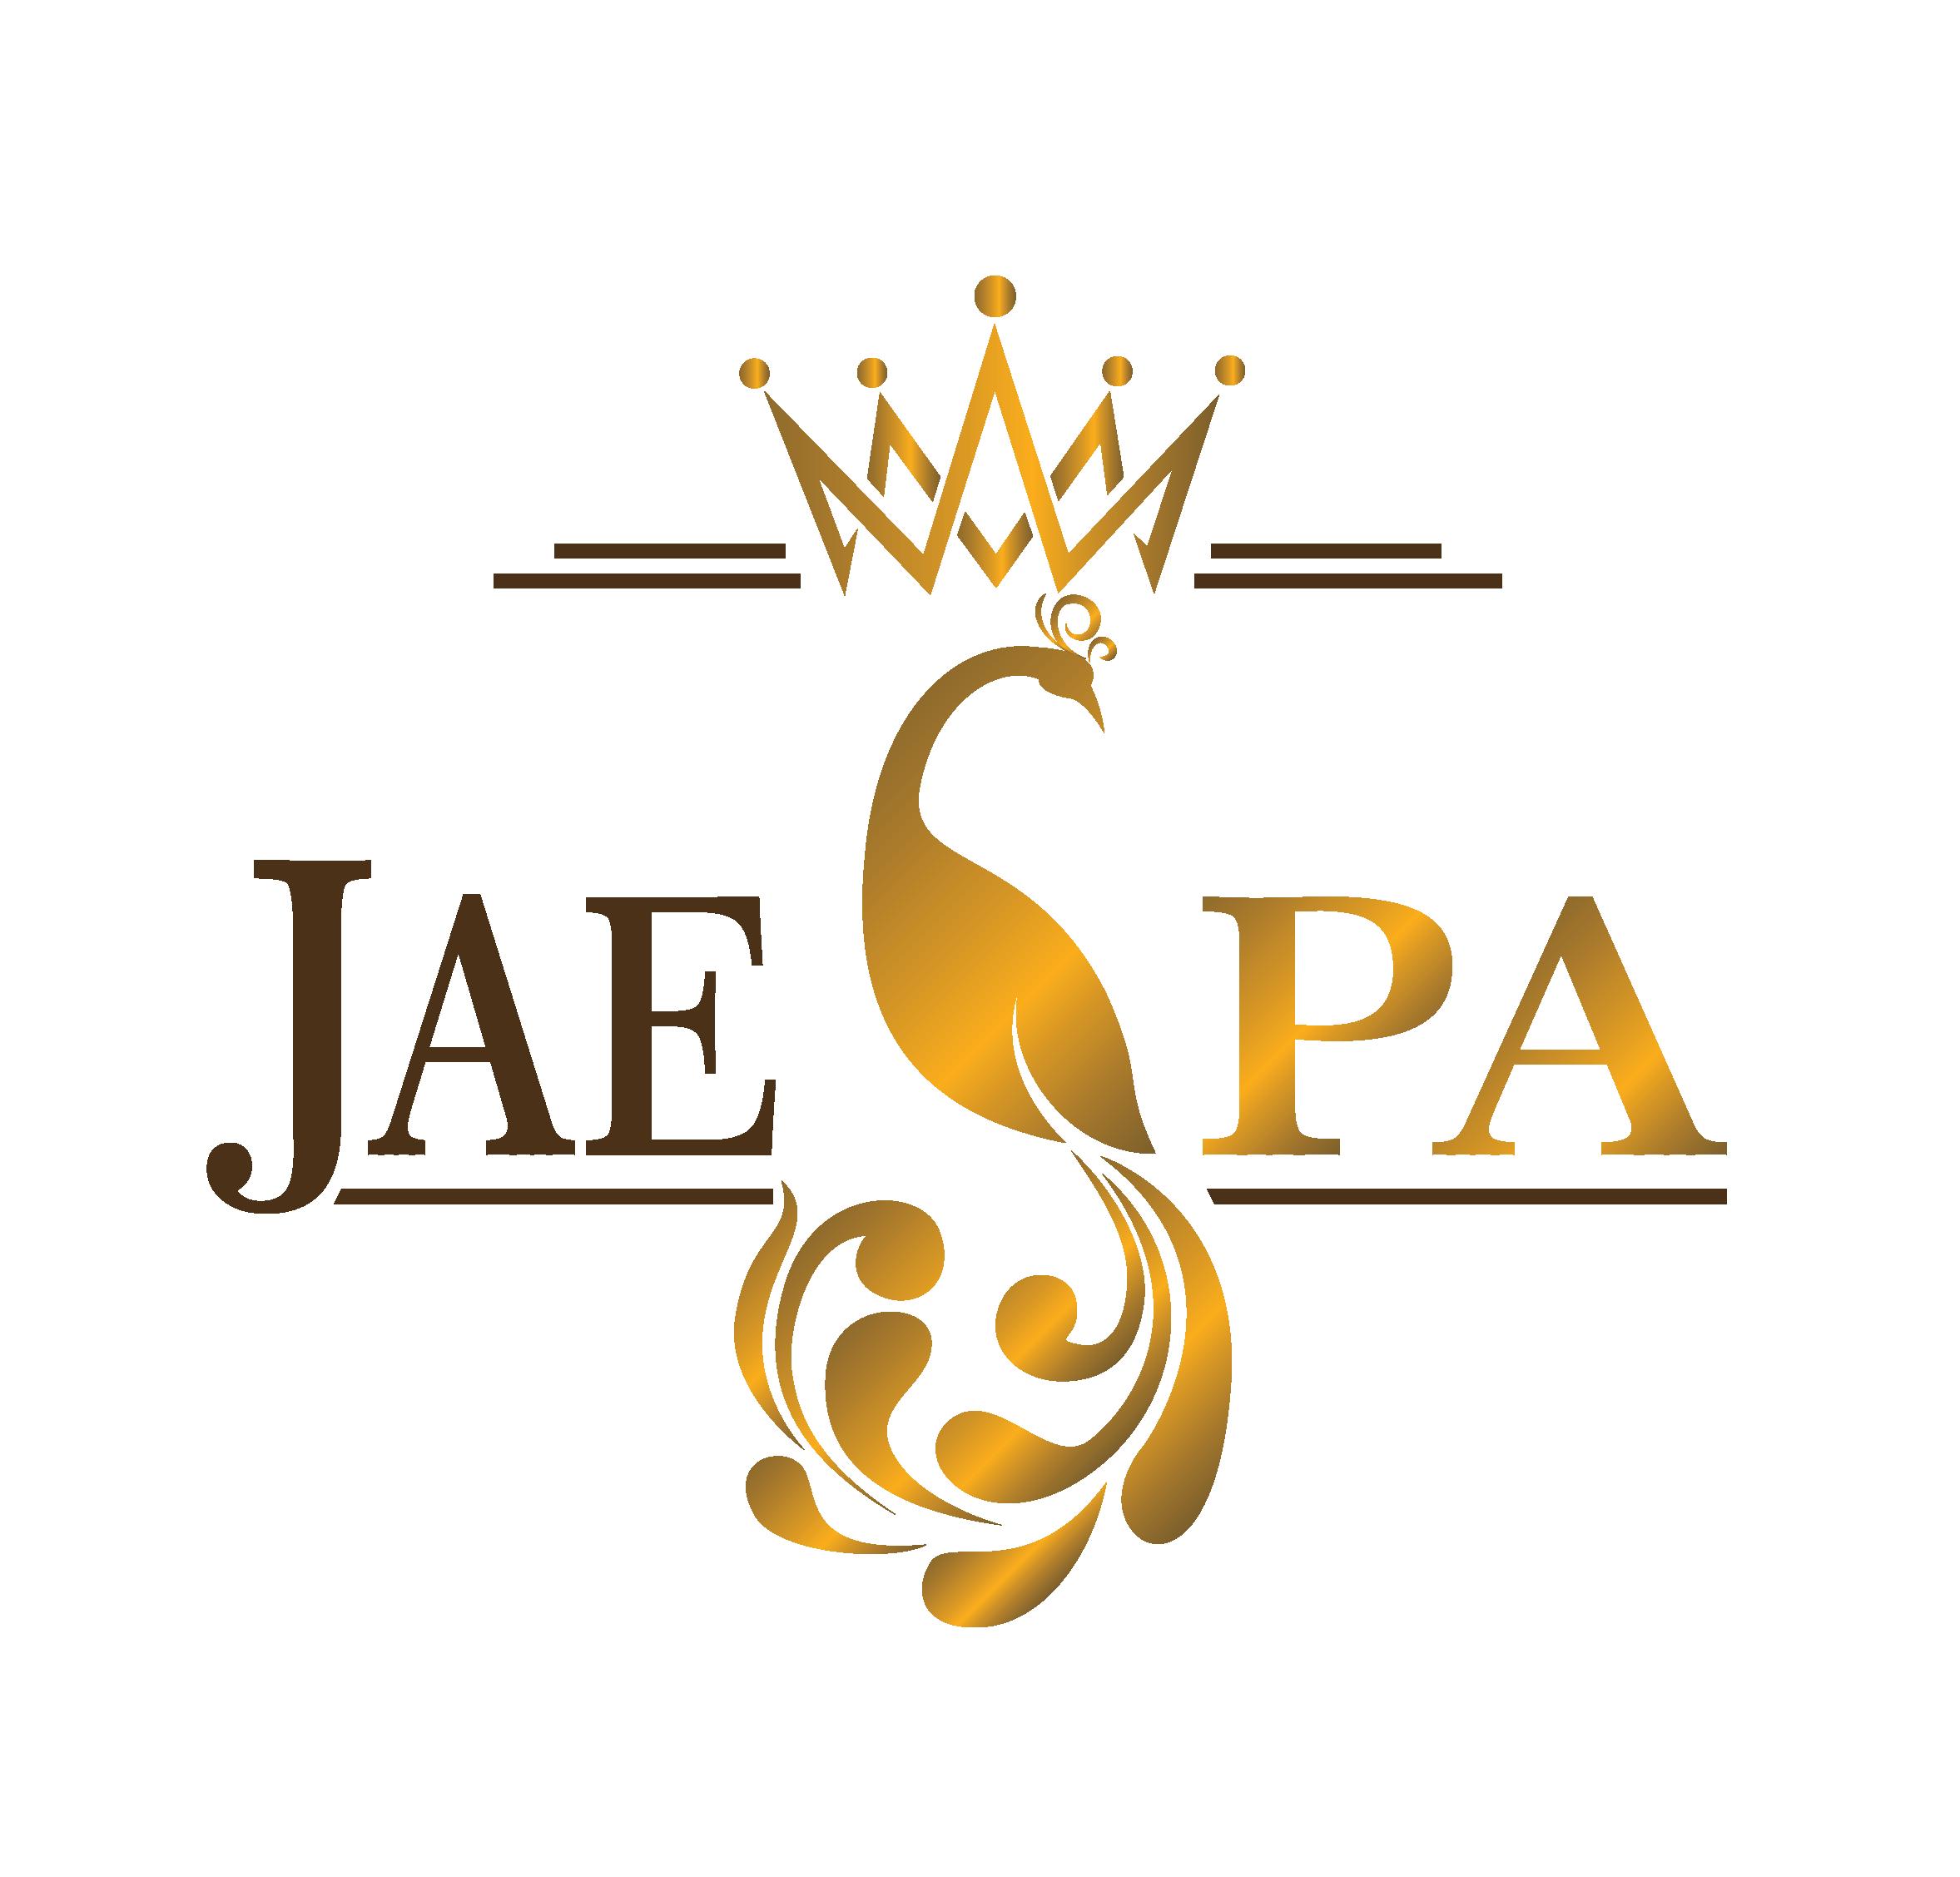 Thẩm Mỹ Viện JaeSpa